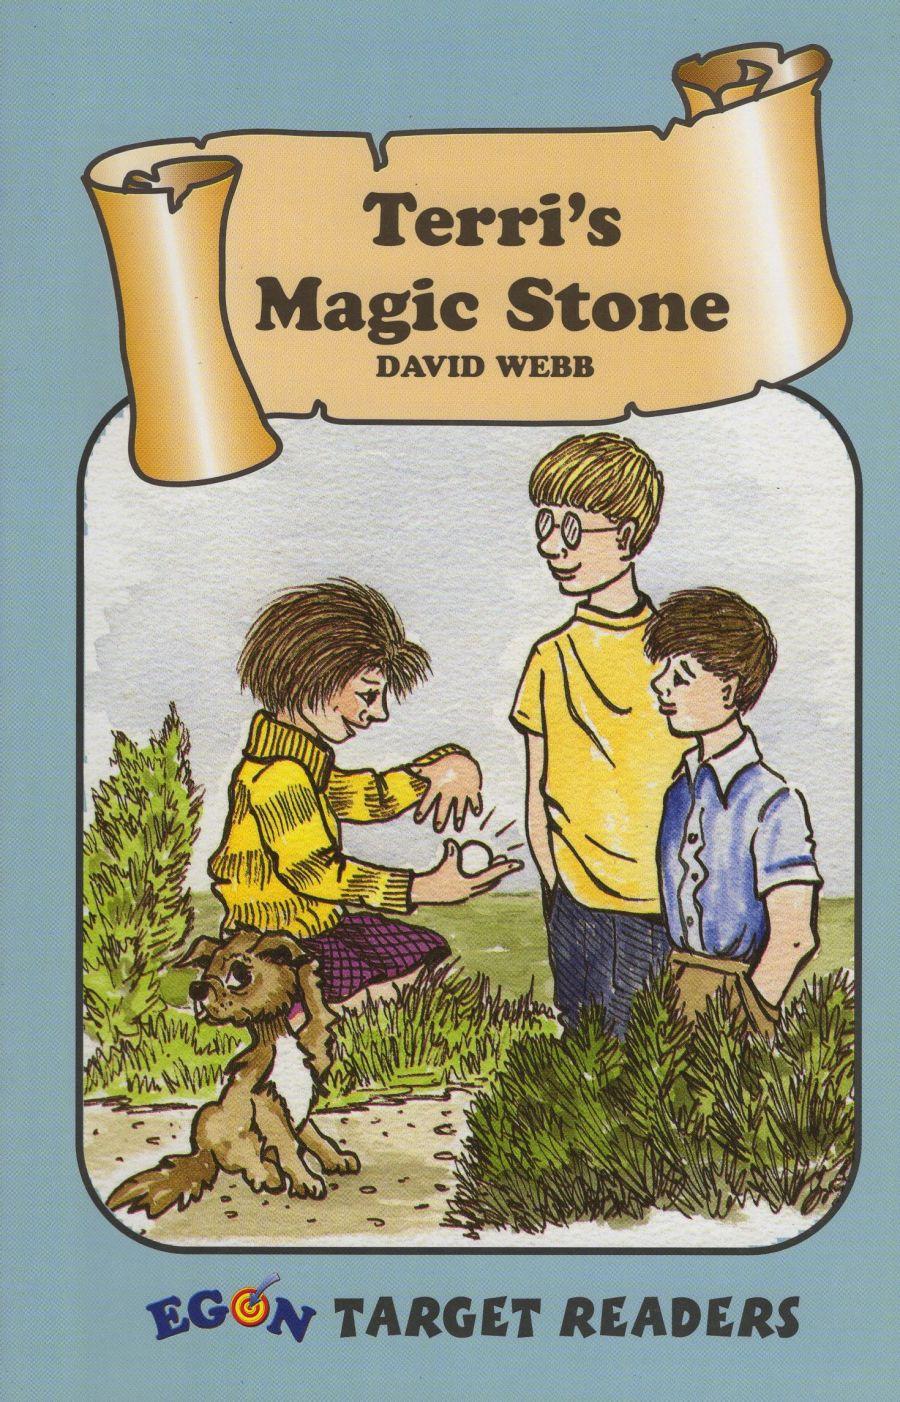 Terri's Magic Stone